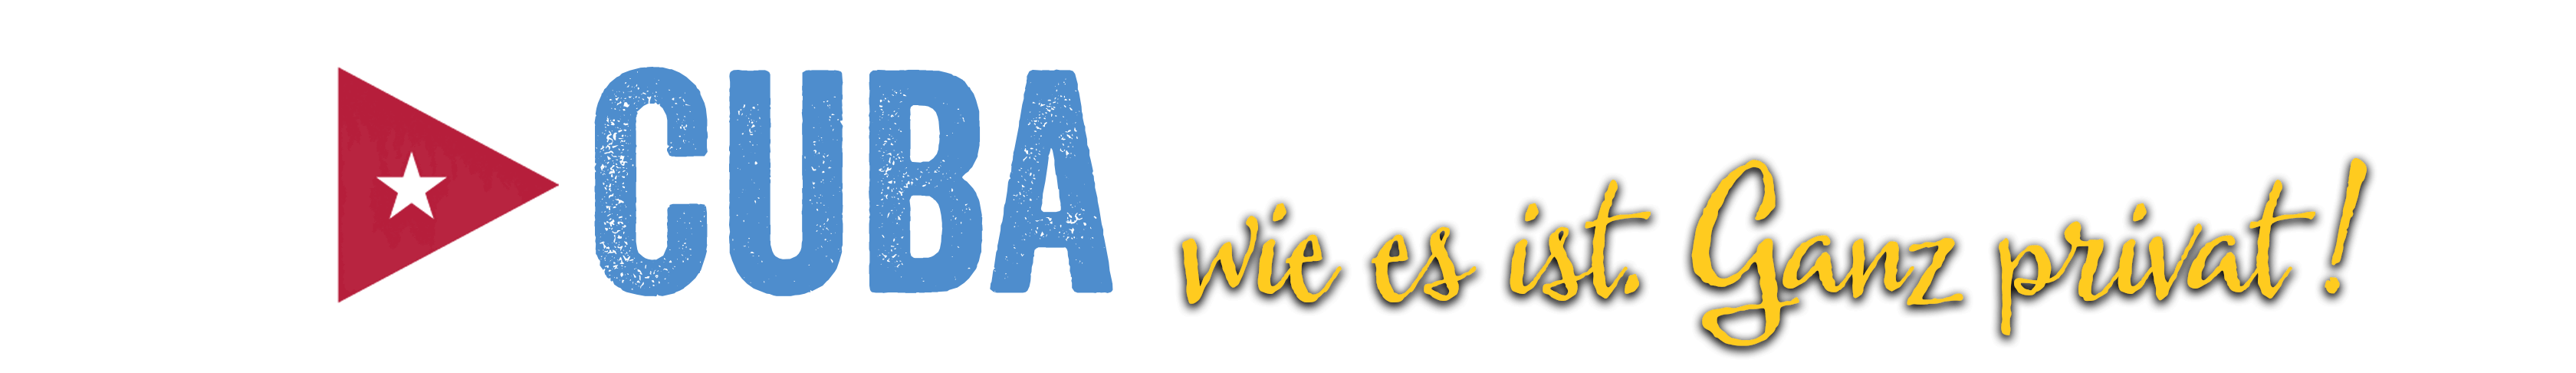 CUBA-WIE-ES-IST_website-header